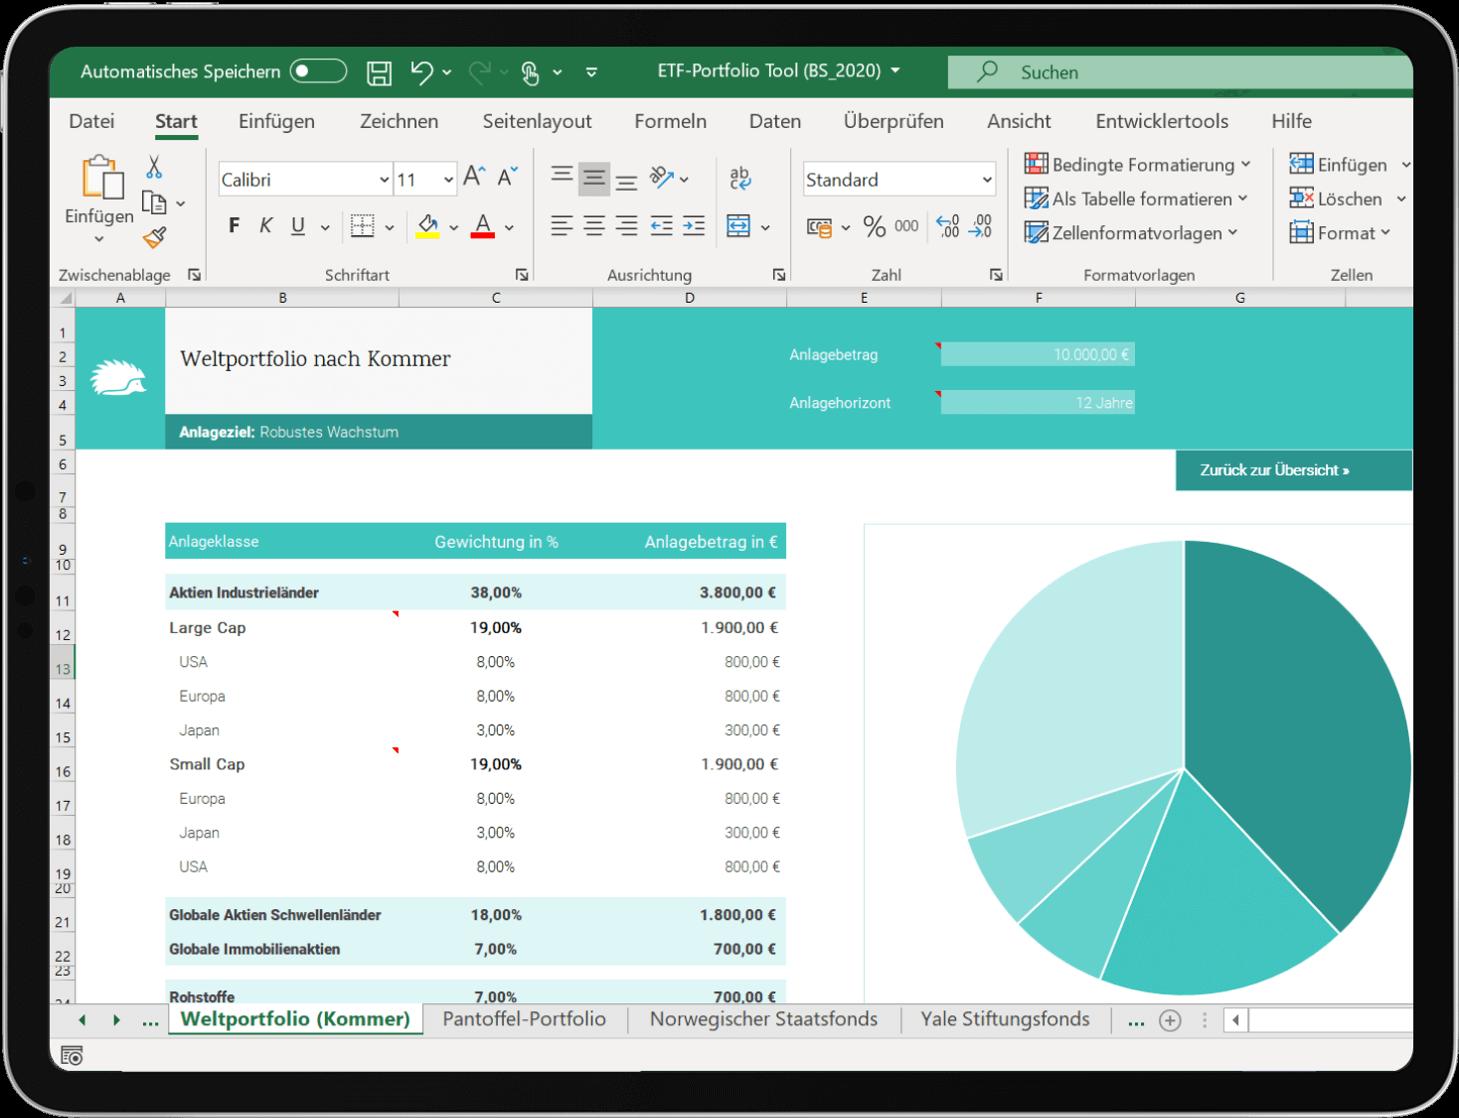 etf-portfolio-tool-header